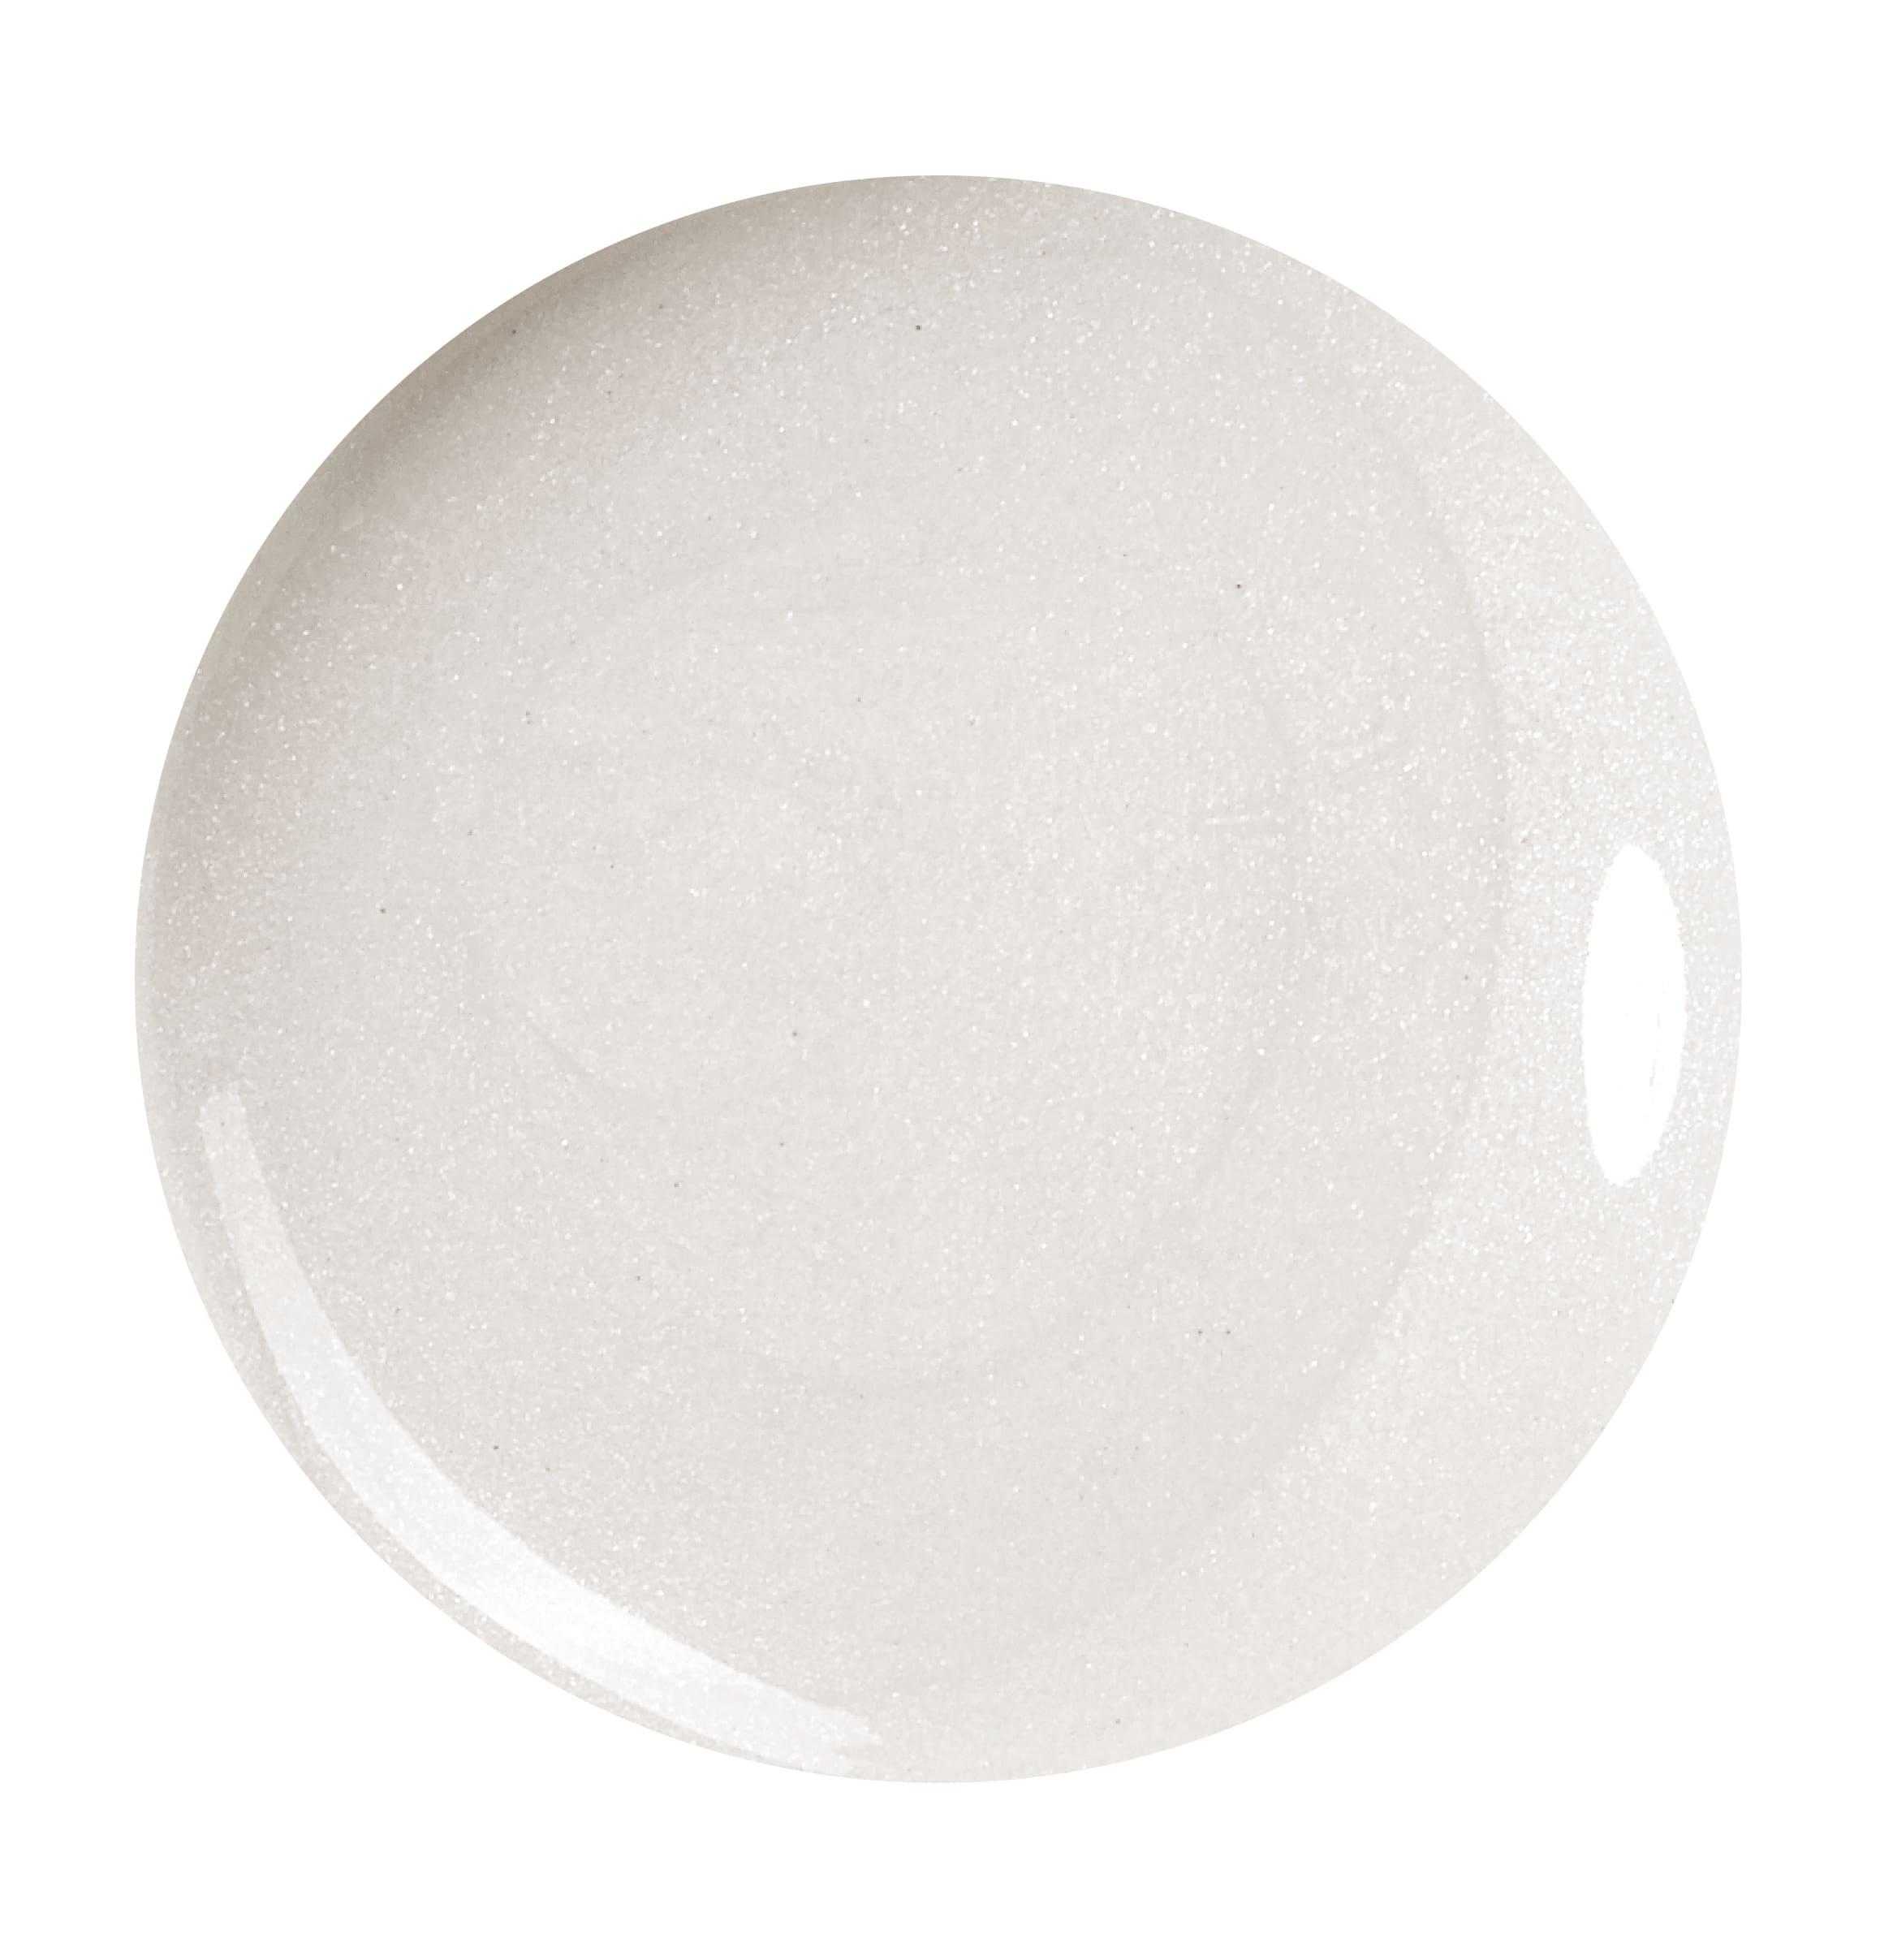 Illuminating Effect Fluid -Sheer Silver 01-